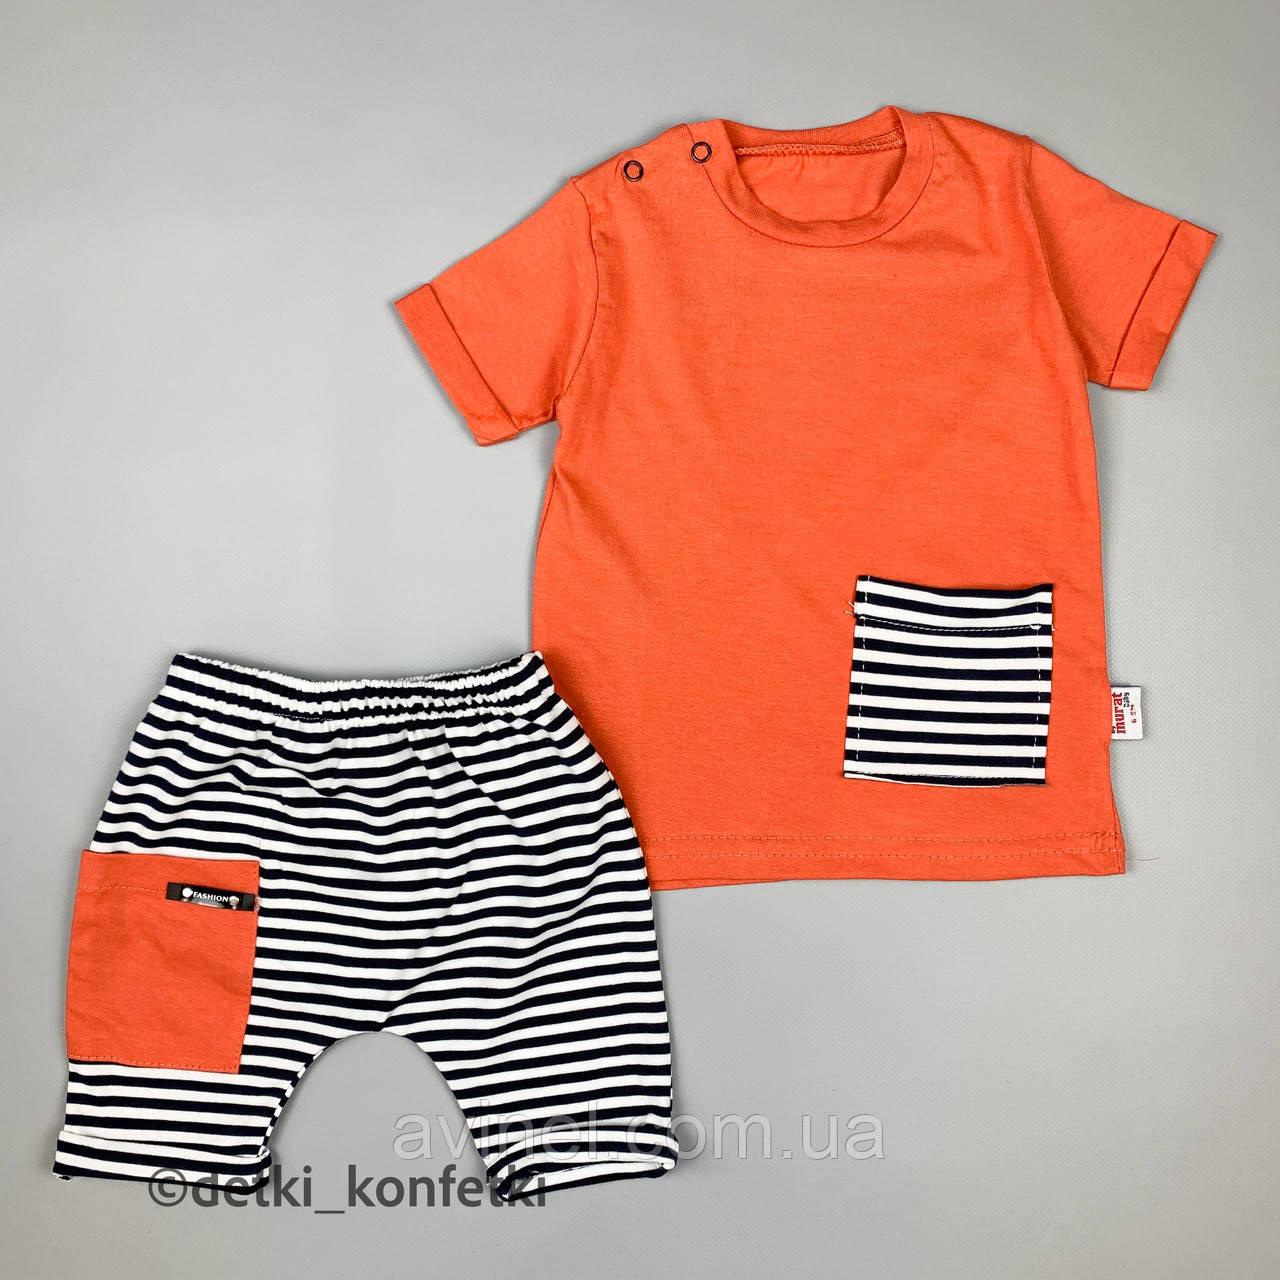 Комплект футболка, шорты оранжевый Интерлок Murat babyТурция 74 (р)